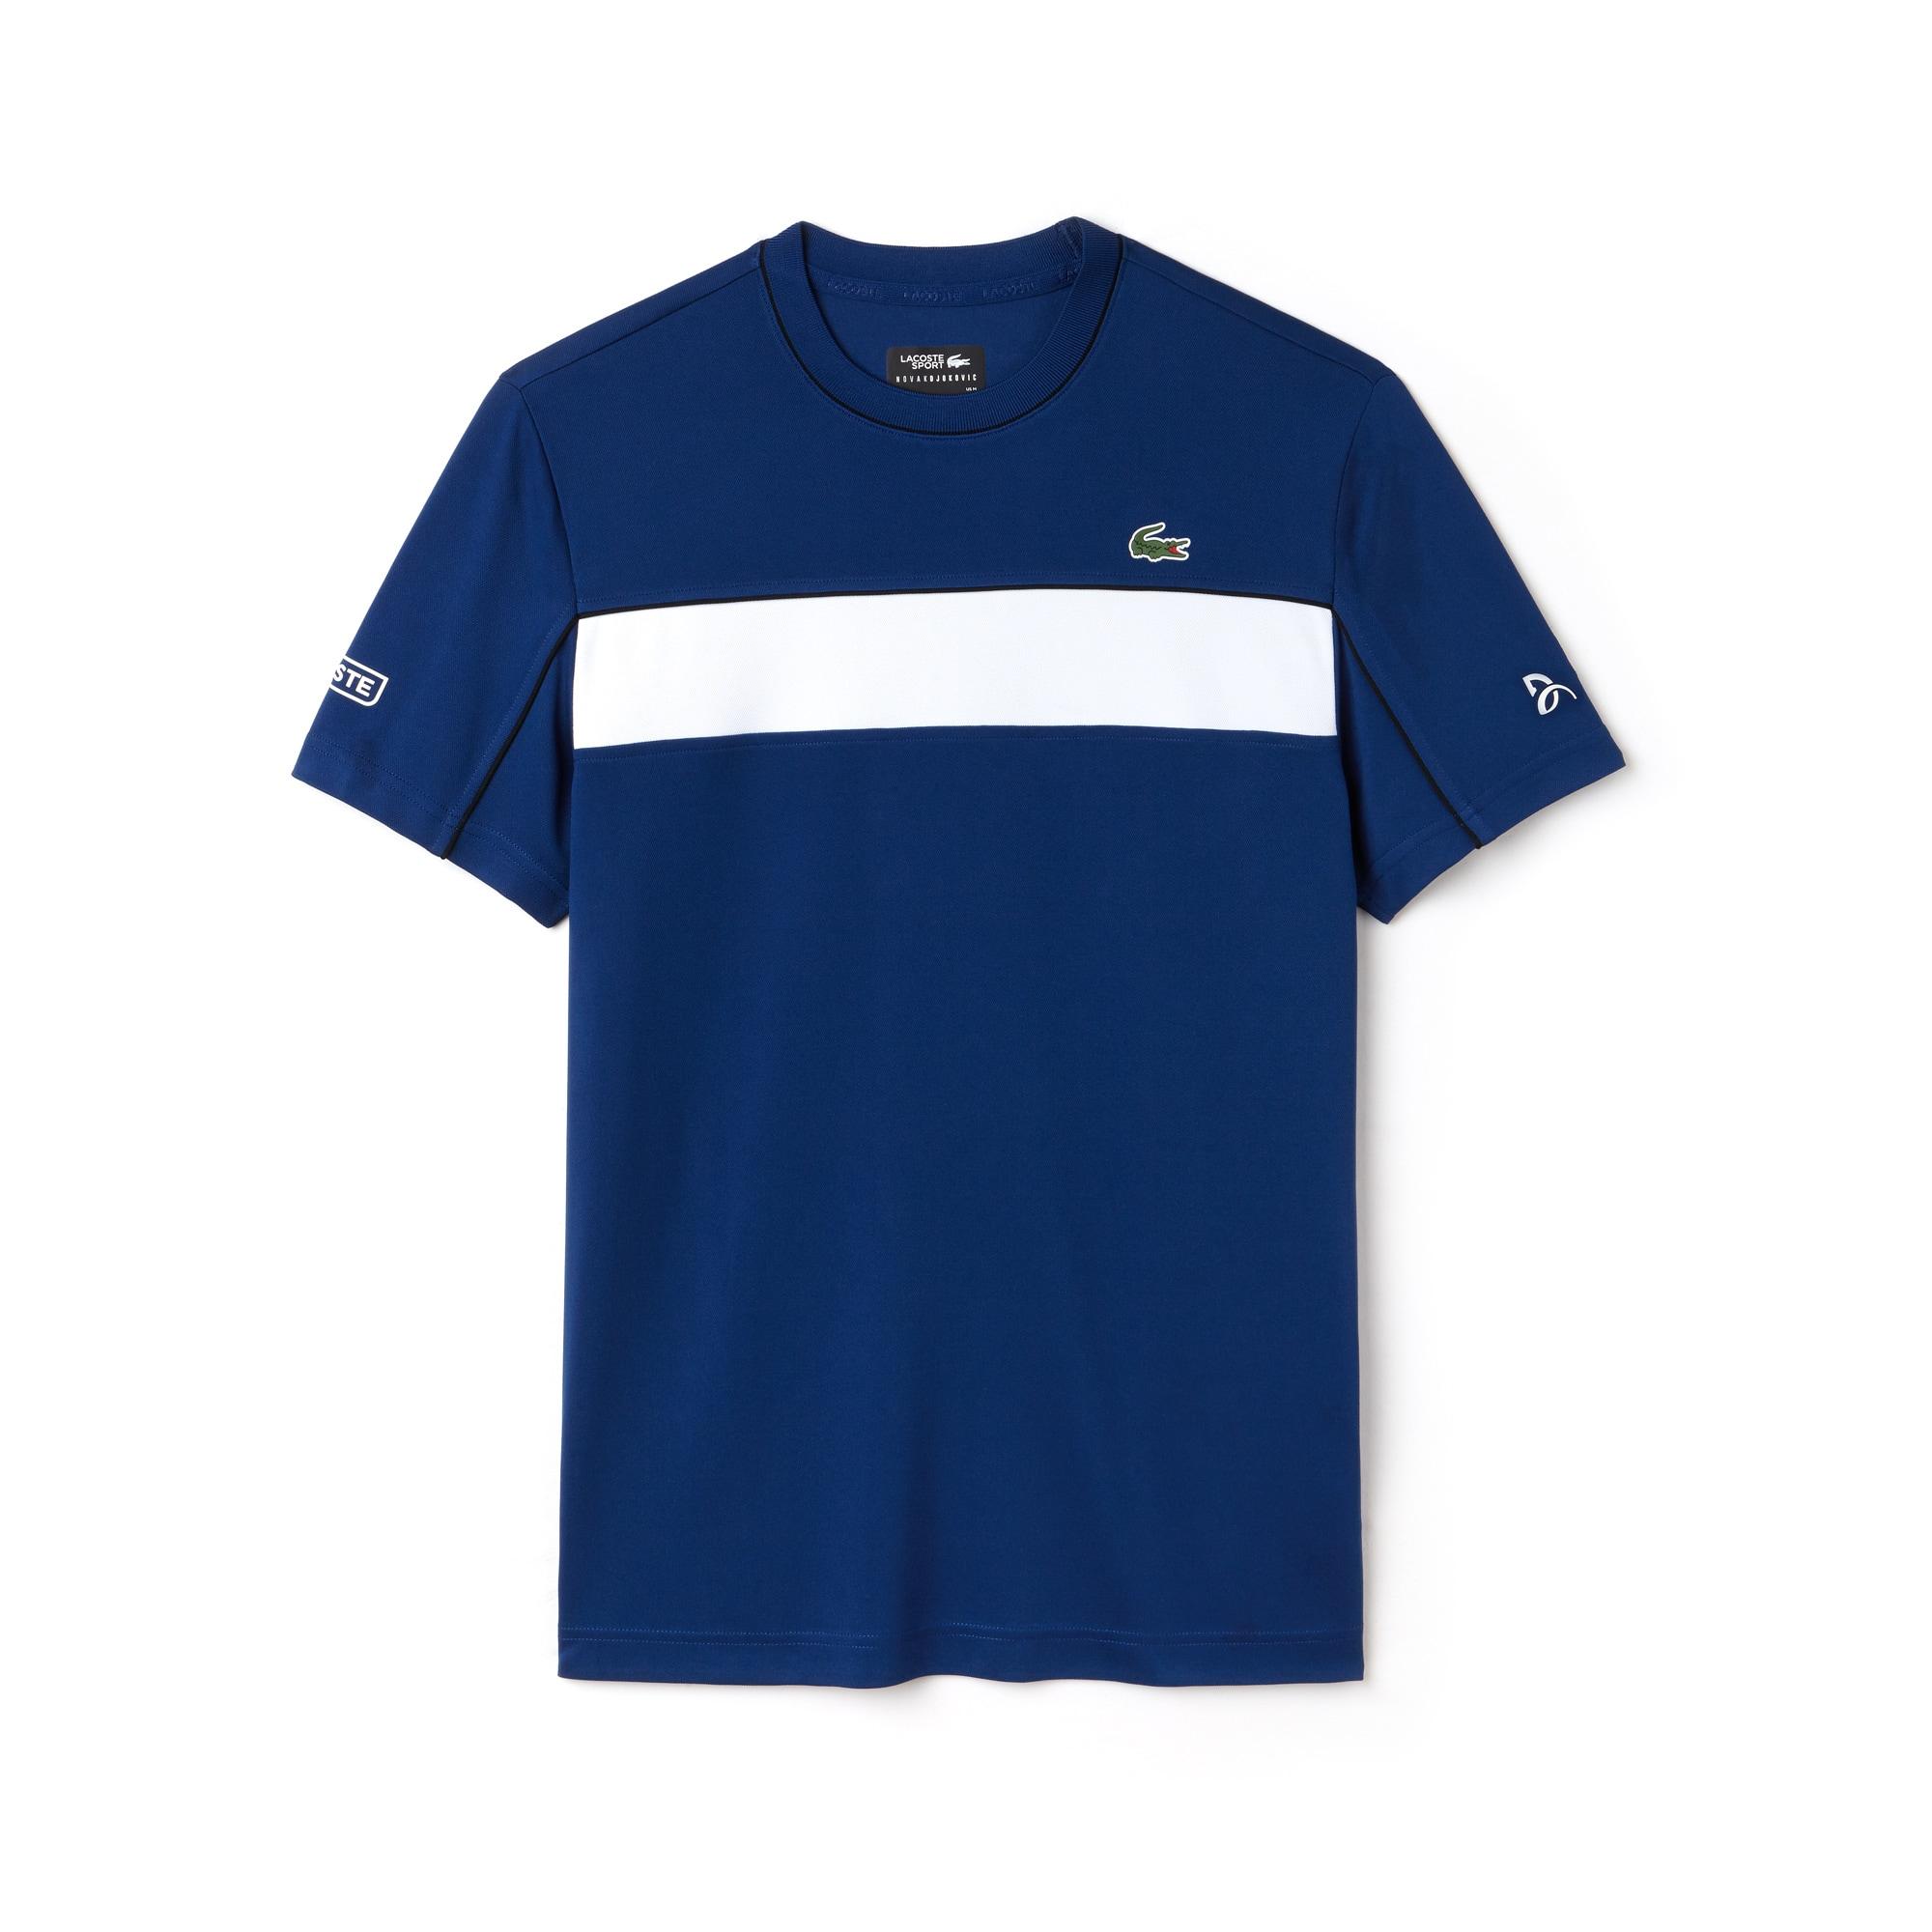 LACOSTE SPORT NOVAK DJOKOVIC COLLECTION-T-shirt heren colorblock technisch piqué